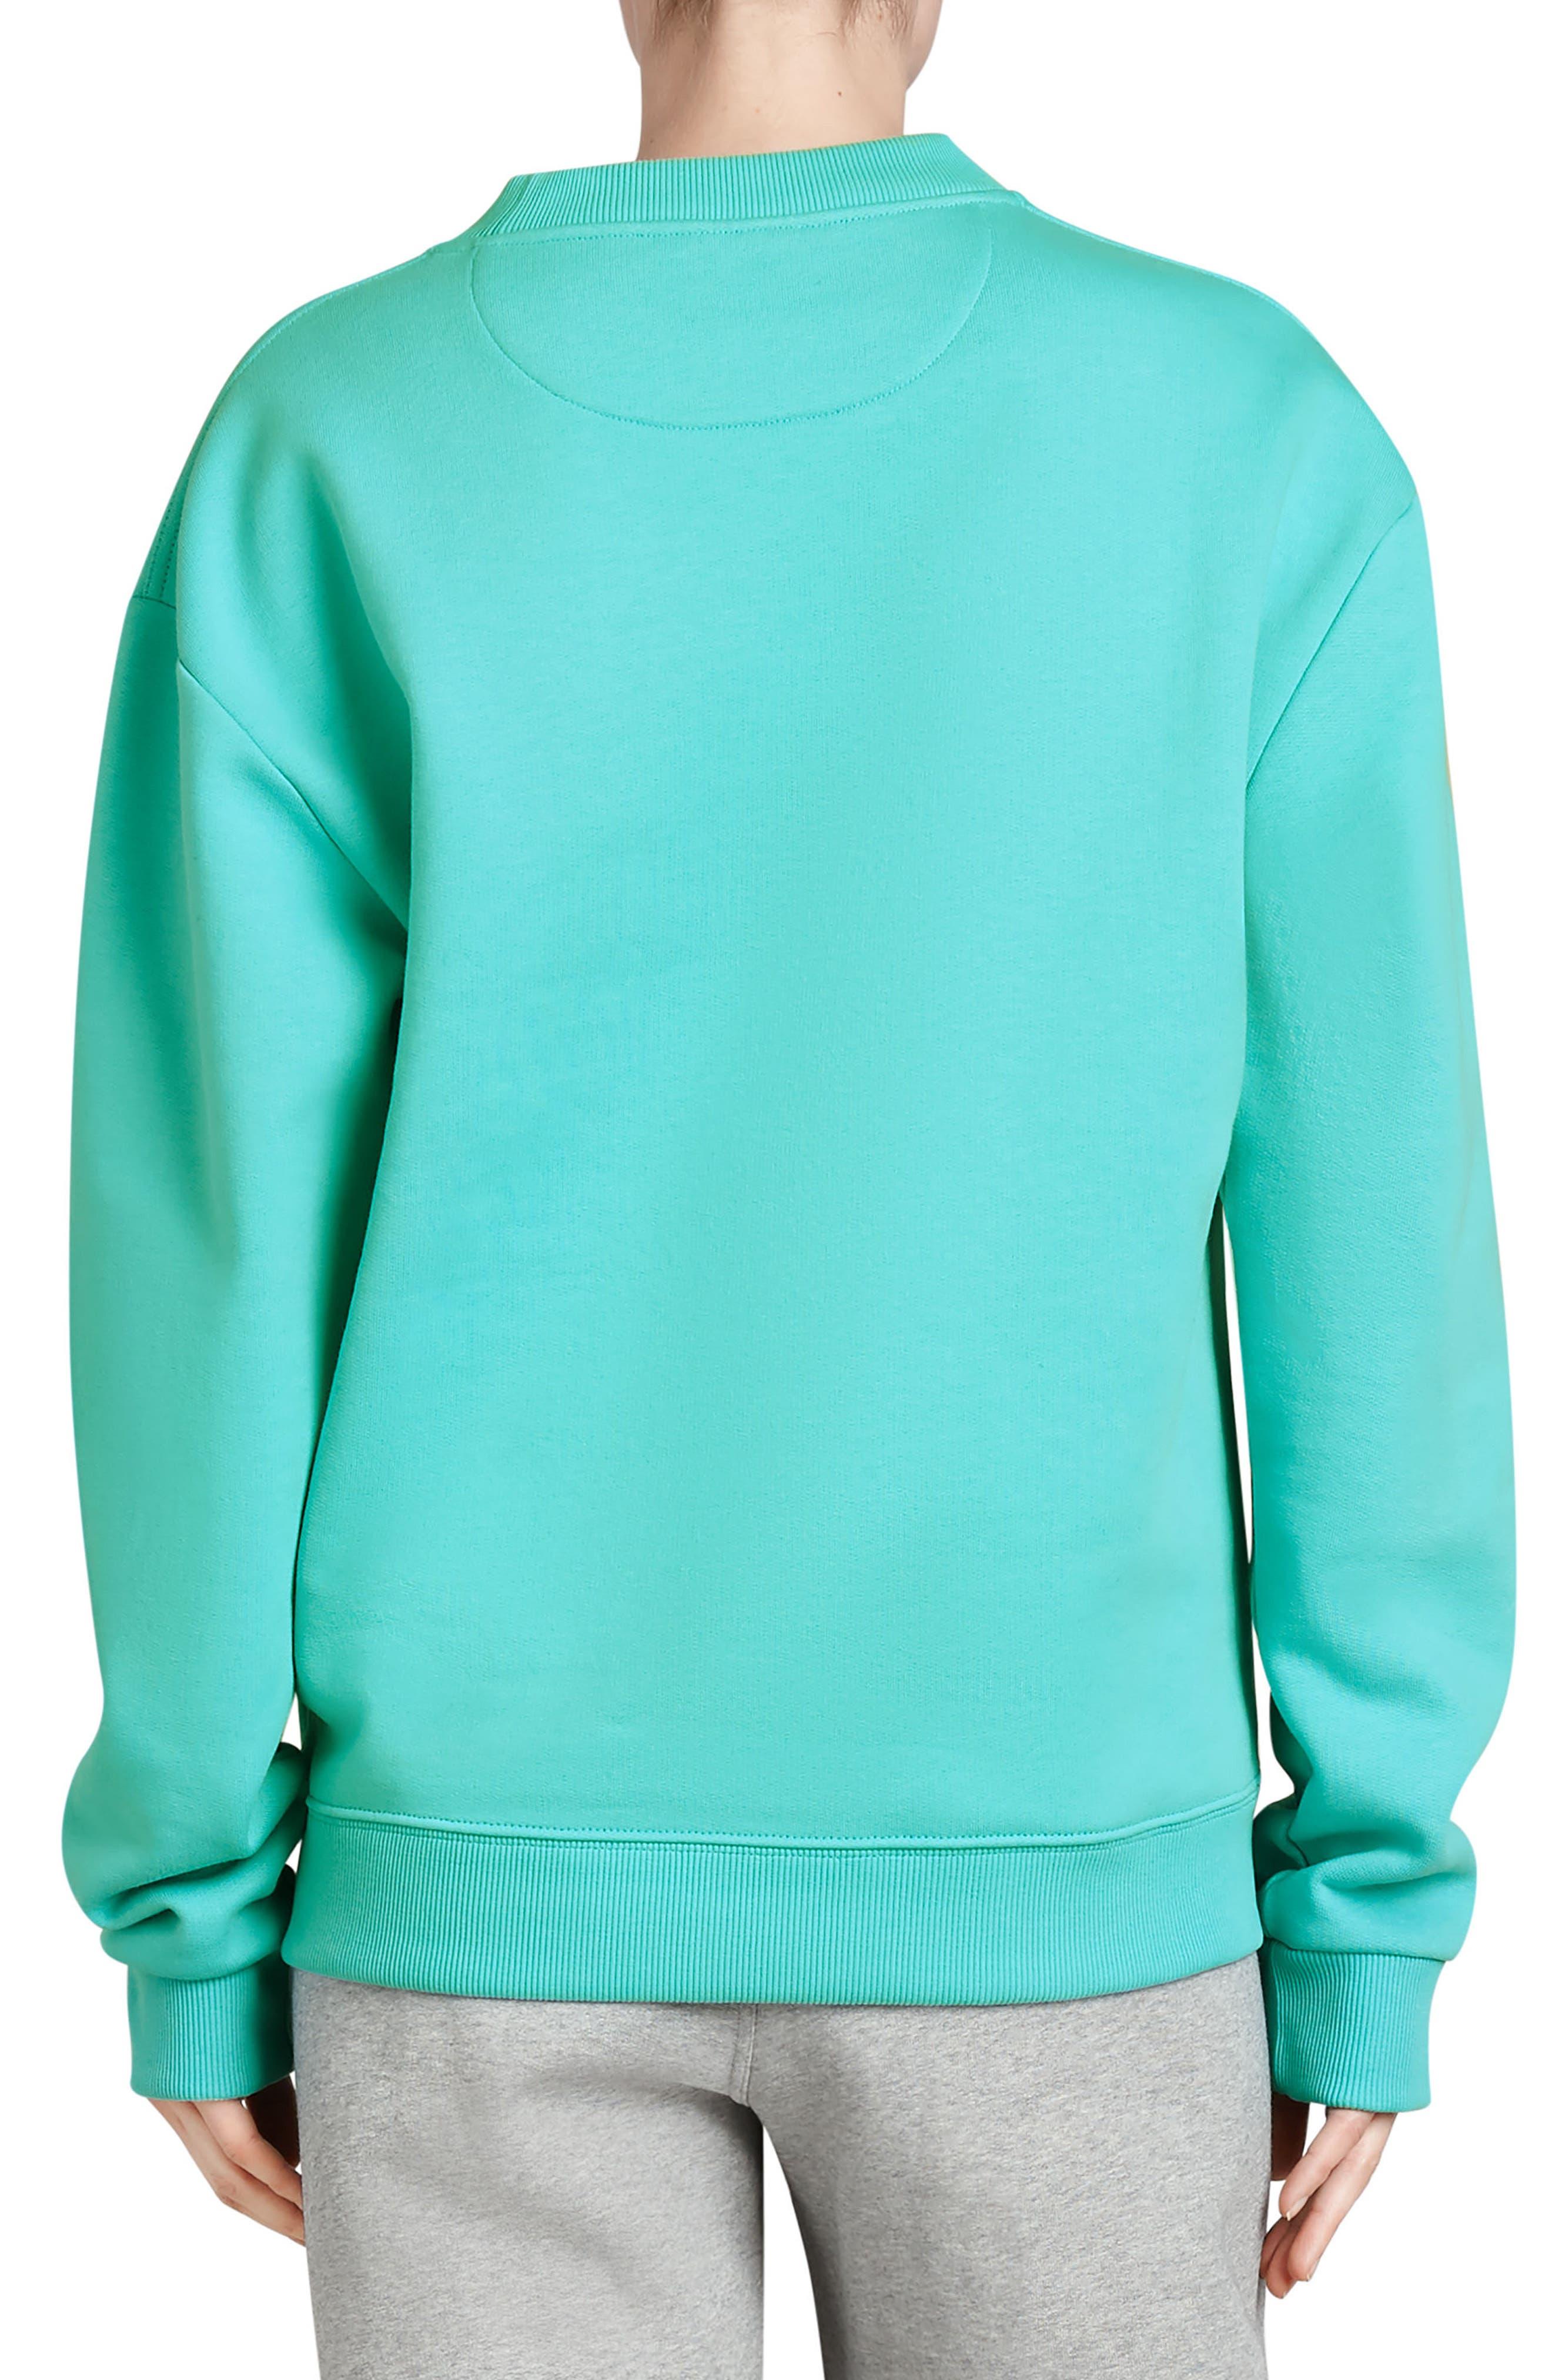 Vintage Crest Sweatshirt,                             Alternate thumbnail 2, color,                             AQUA